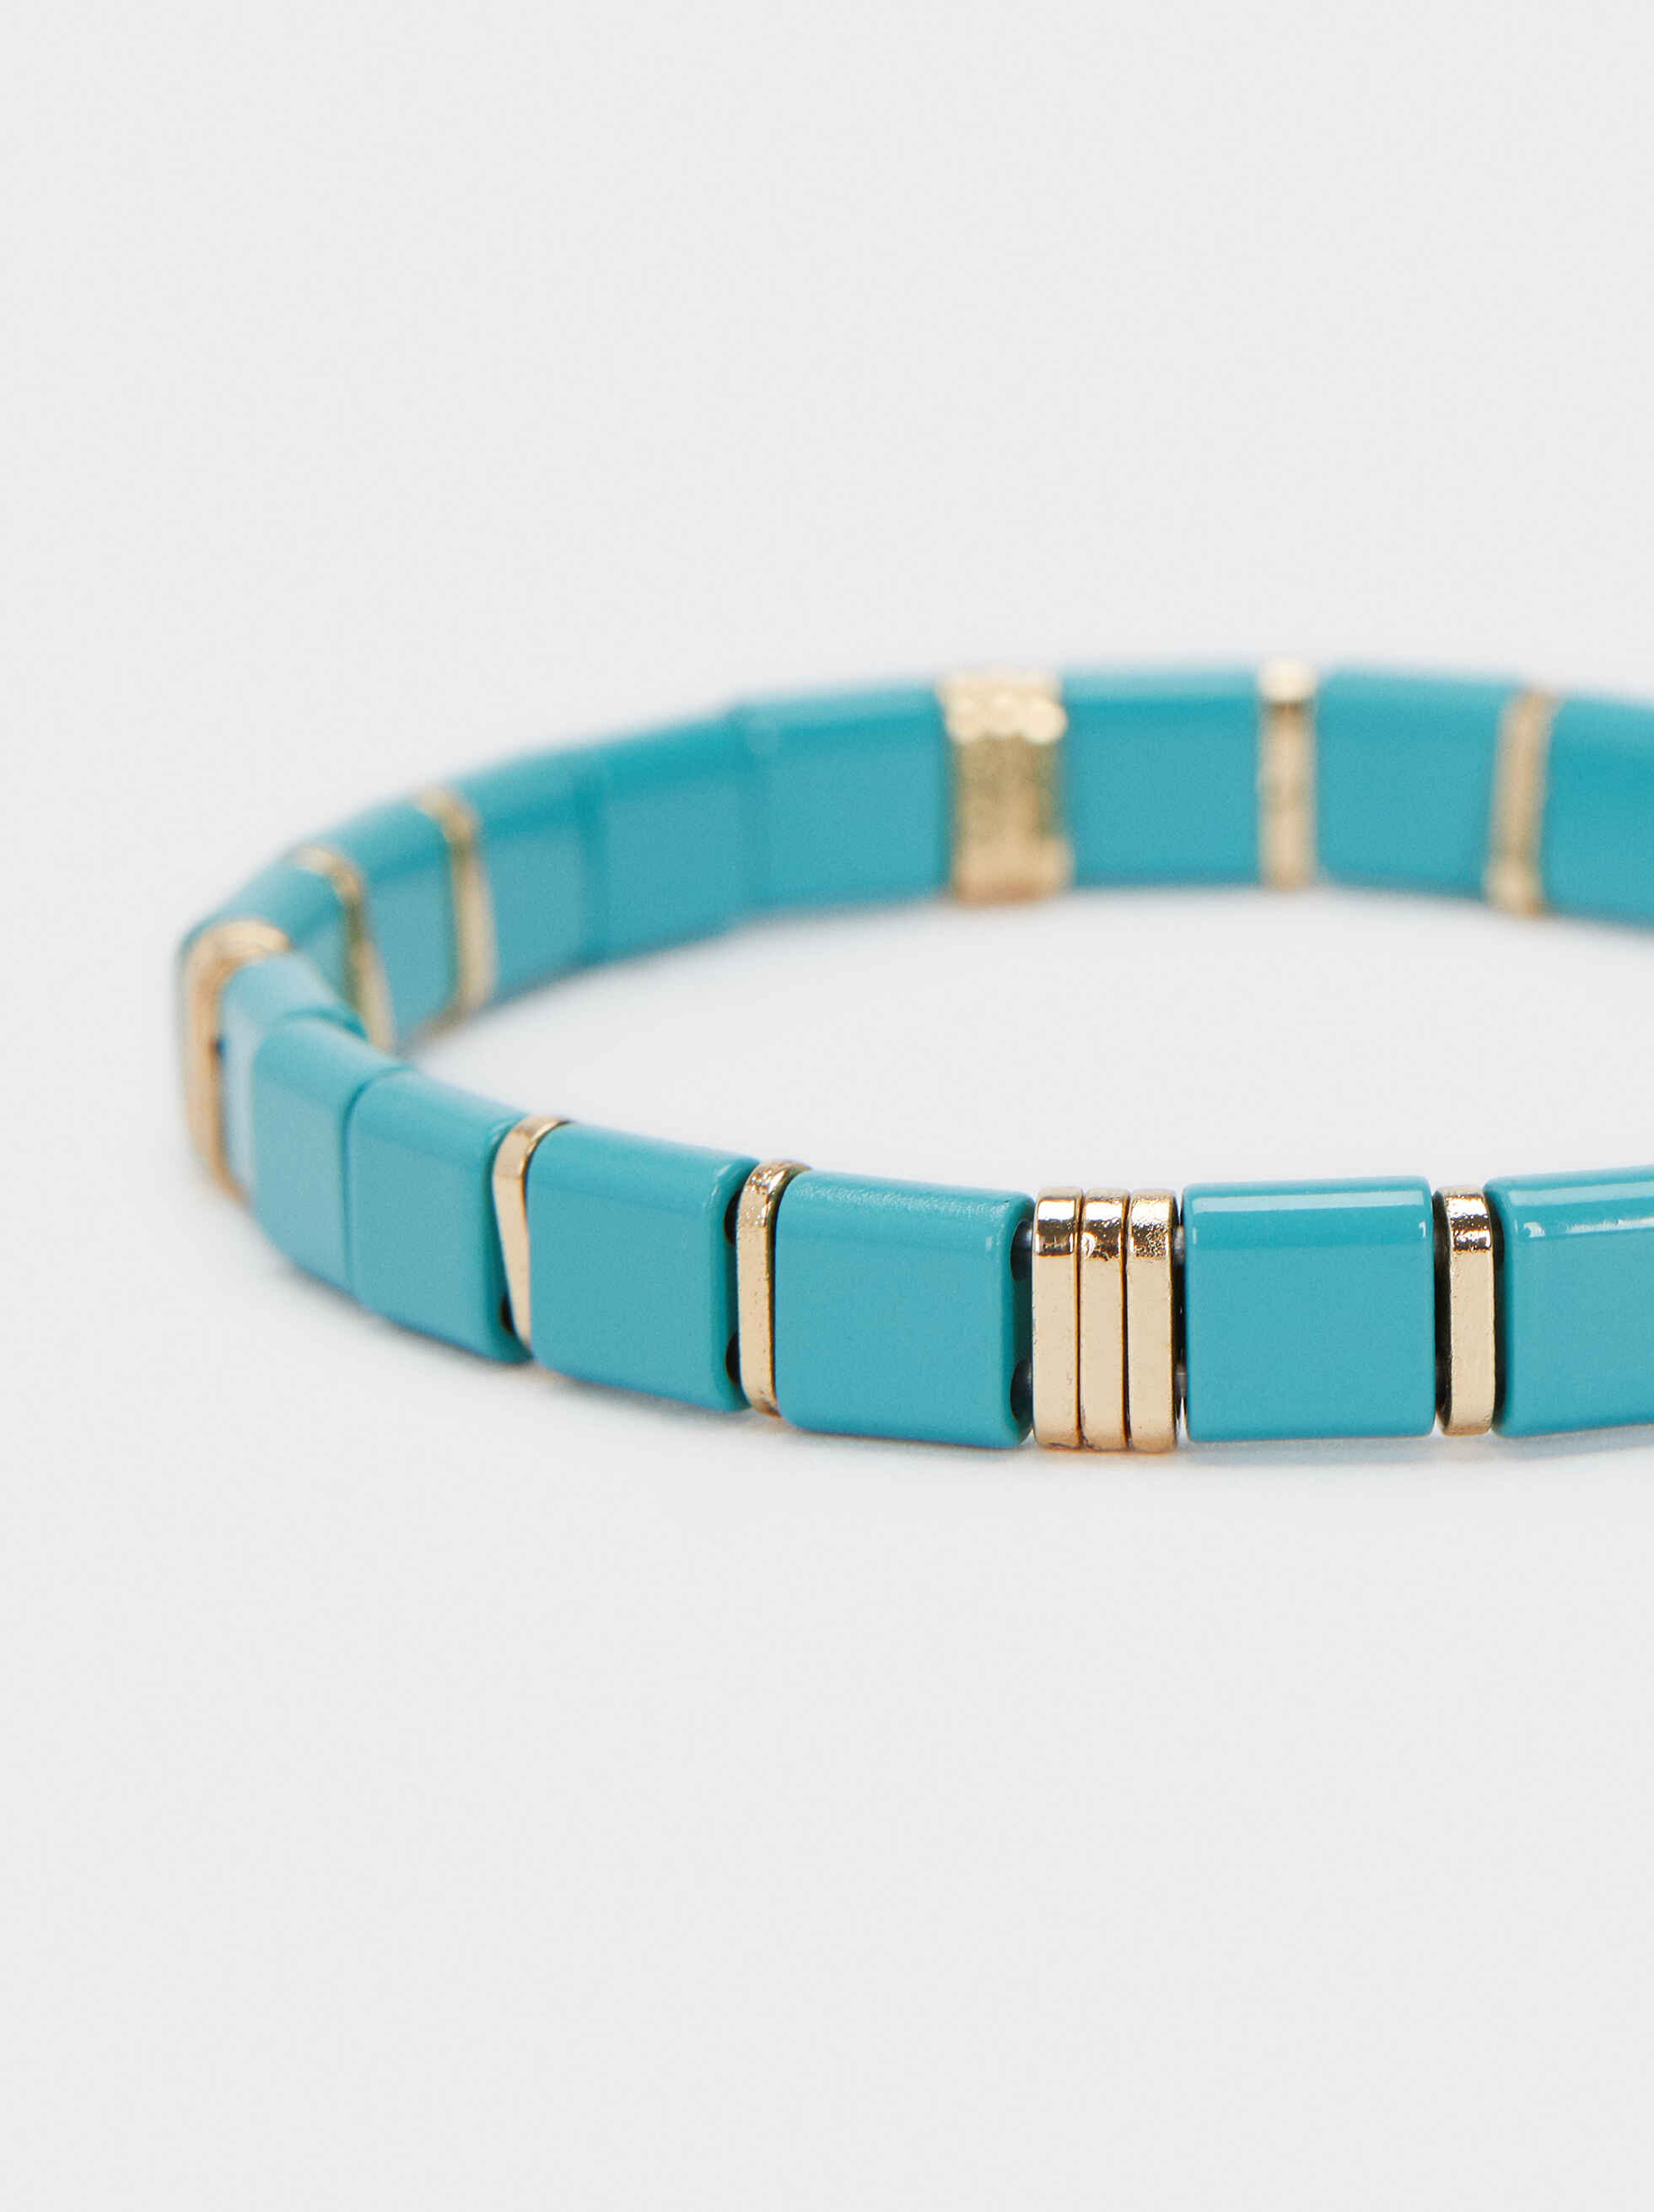 Elastic Bracelet With Stones, Beige, hi-res